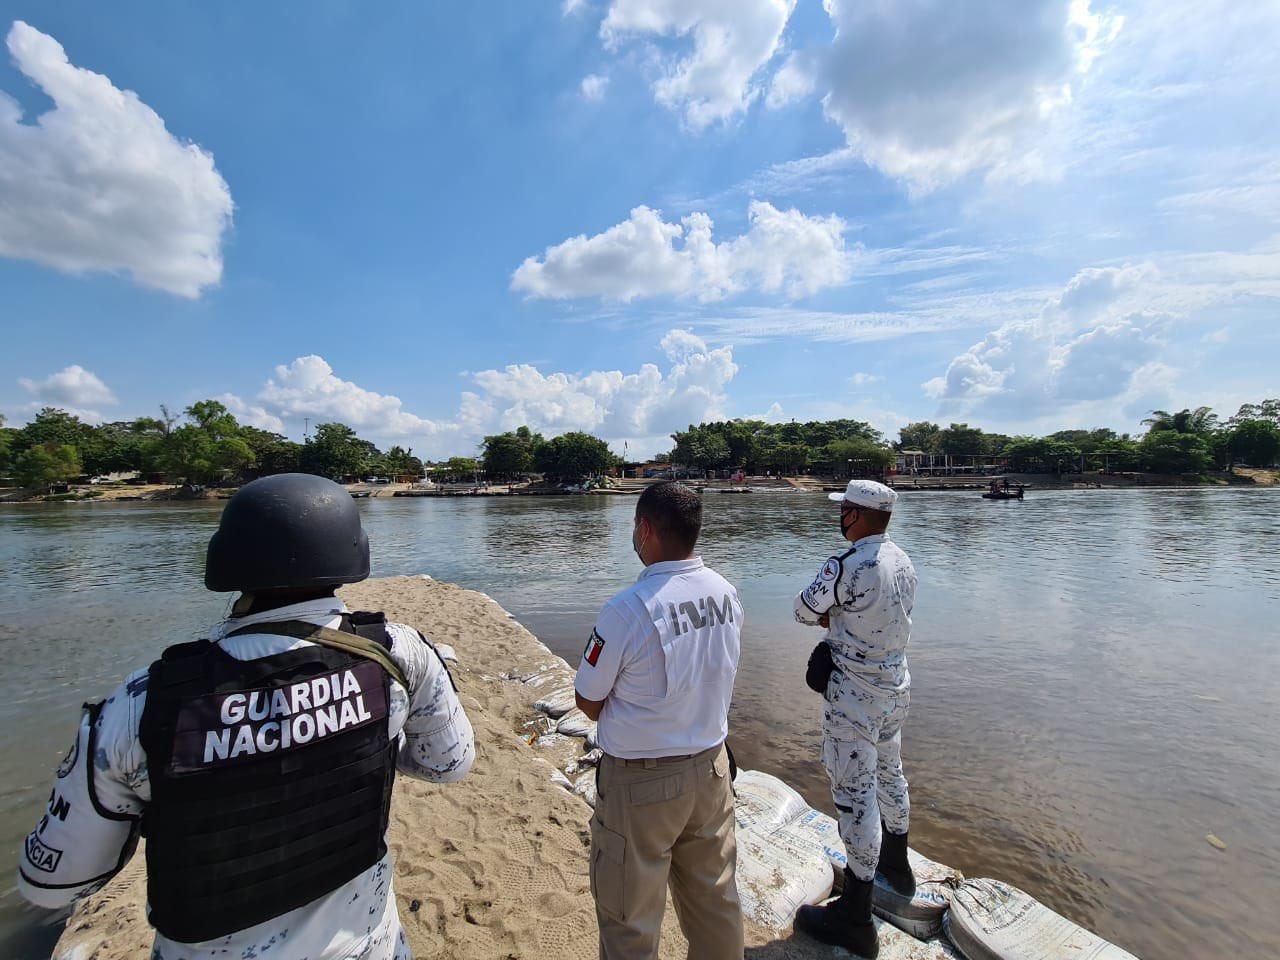 Aplica INM operativo  24 horas por paso de caravana de migrantes